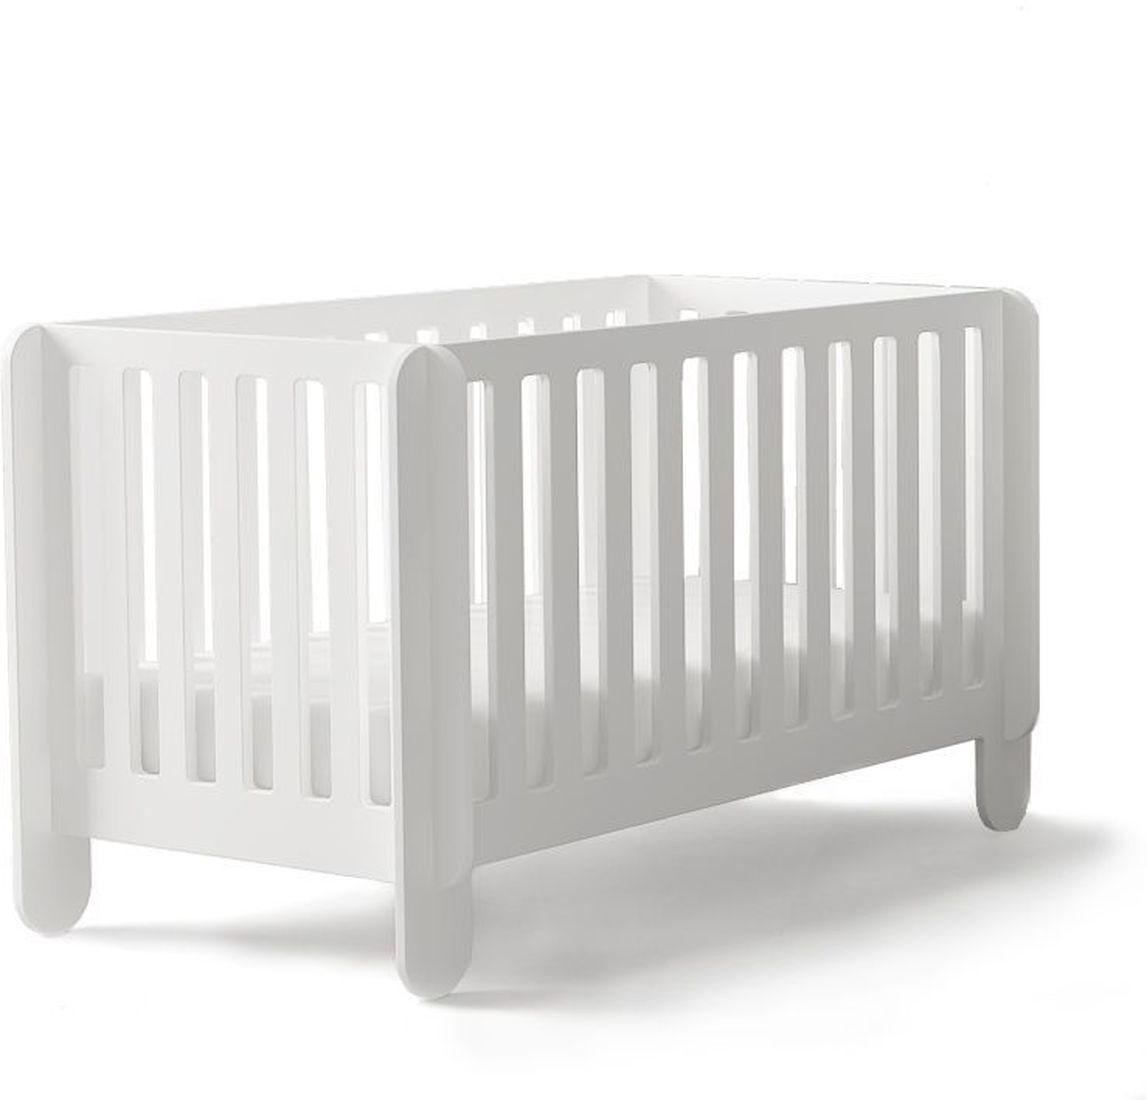 Oeuf babybett elephant crib babybetten kinderzimmerm bel kinderzimmer - Kinderzimmermobel baby ...